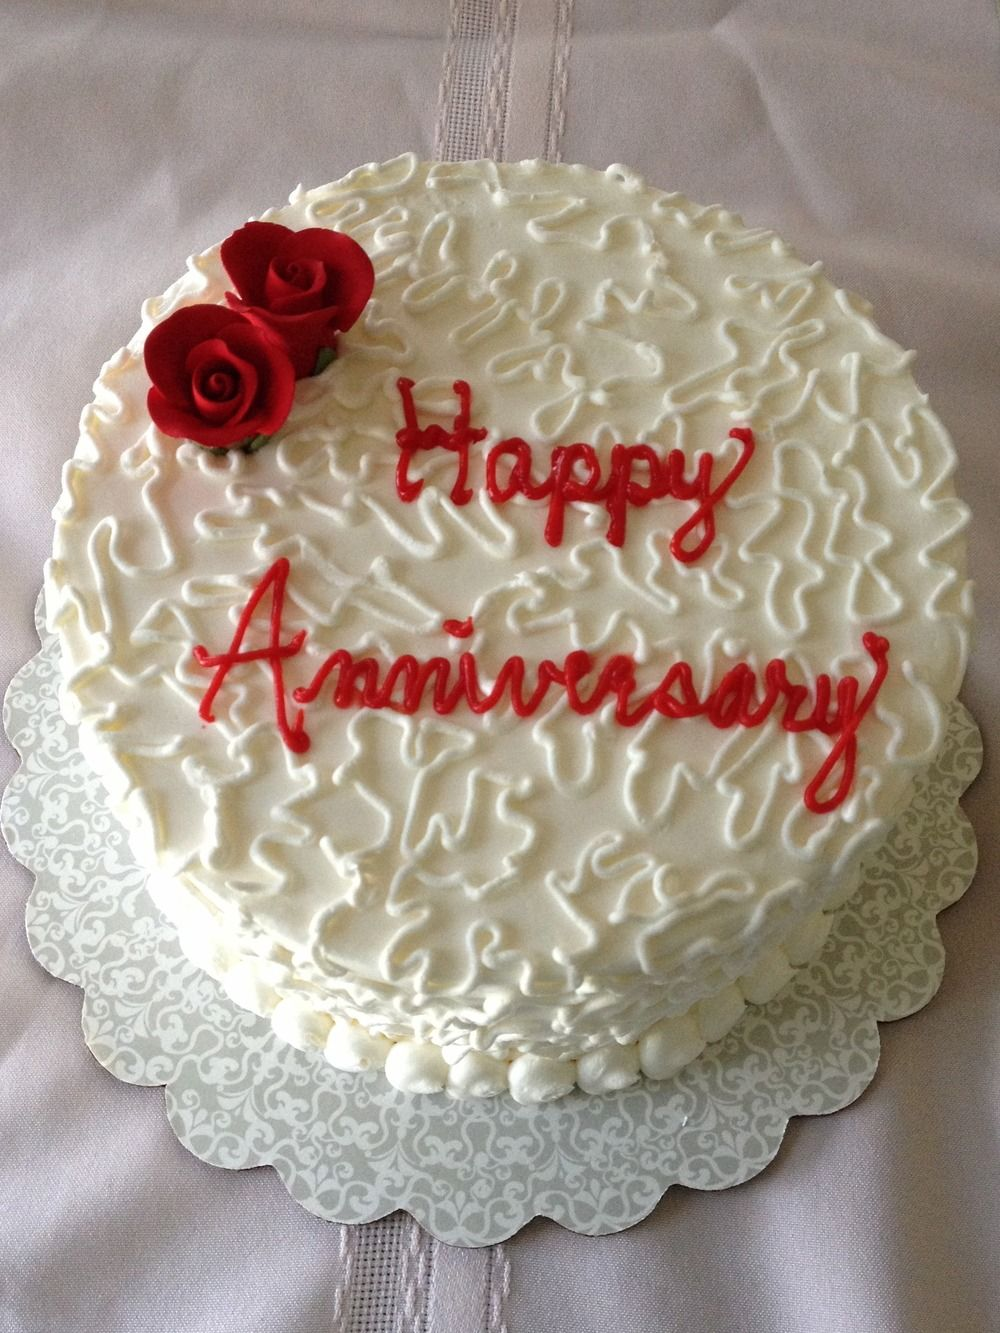 Midnight Cakes In Hyderabad Online Cake Delivery In Hyderabad In 2020 Happy Anniversary Cakes Happy Marriage Anniversary Cake Wedding Anniversary Wishes